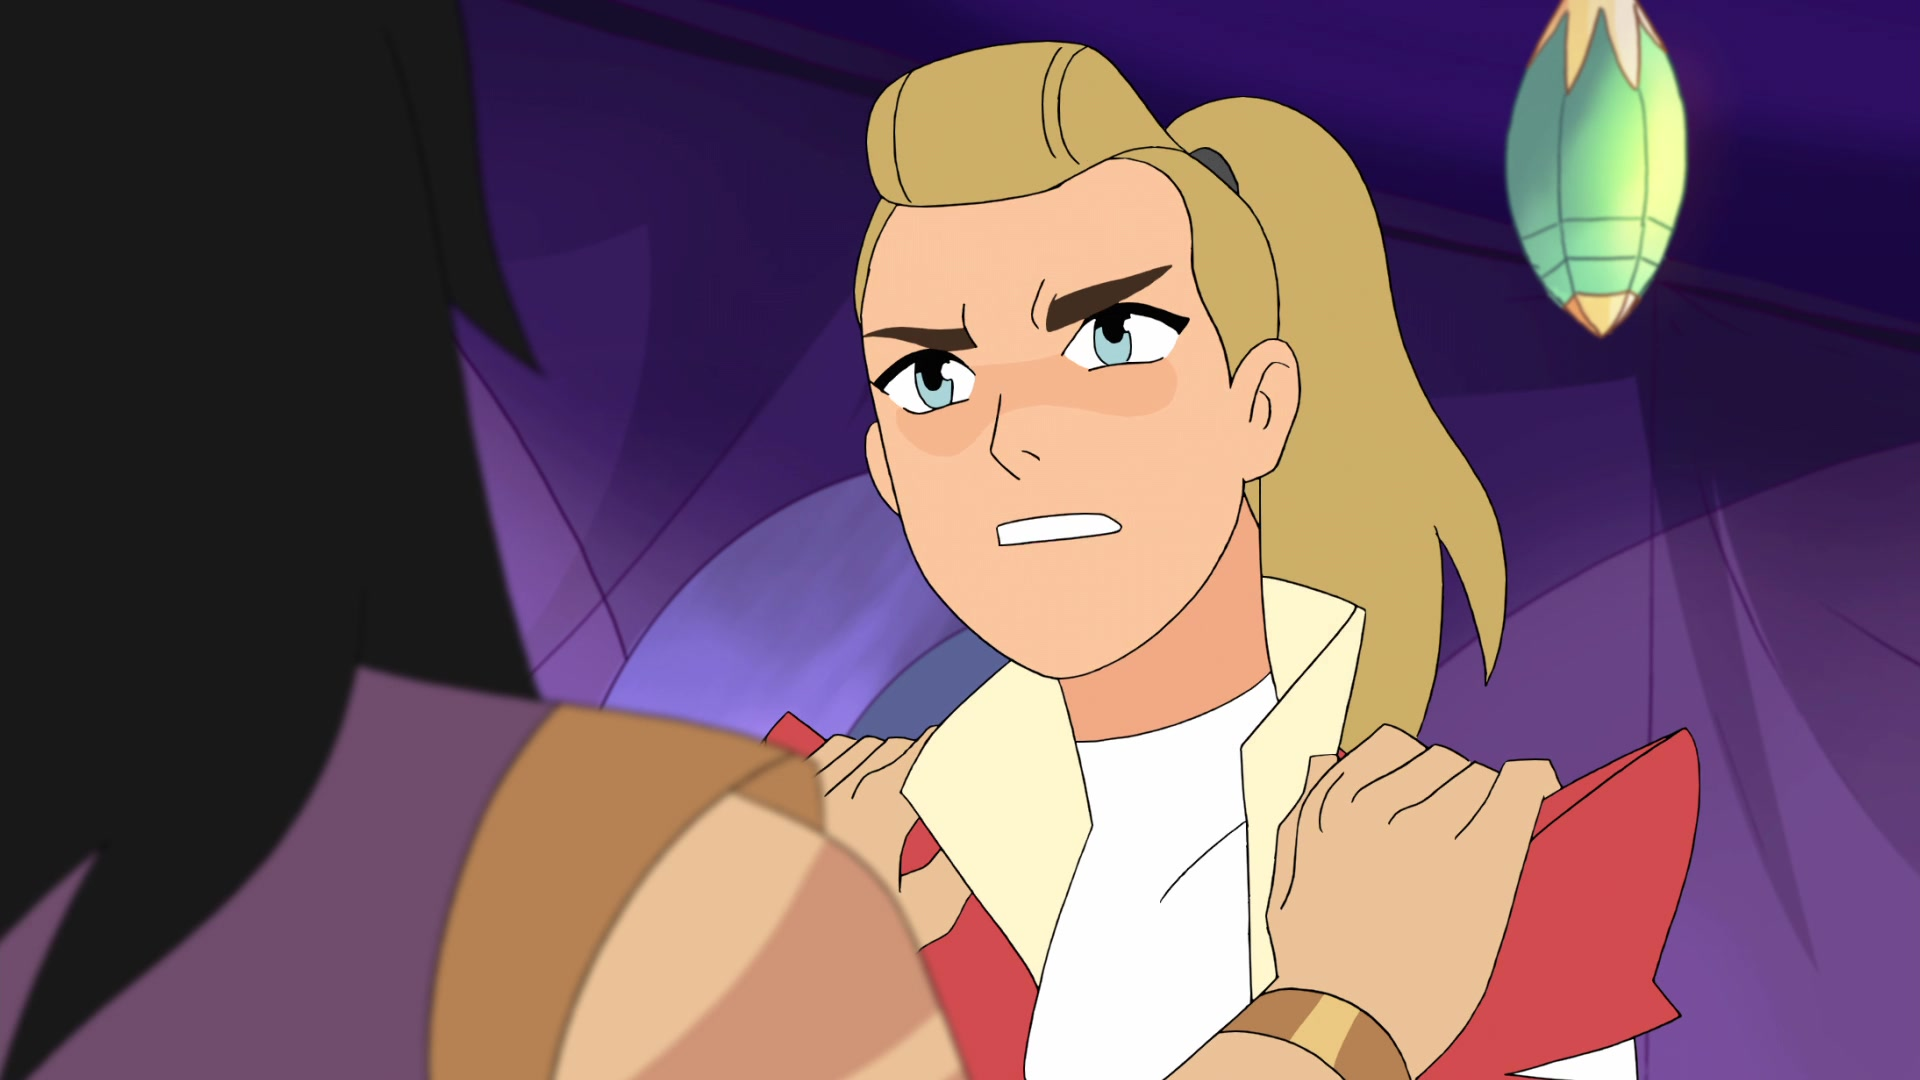 She-Ra and the Princesses of Power S05E01